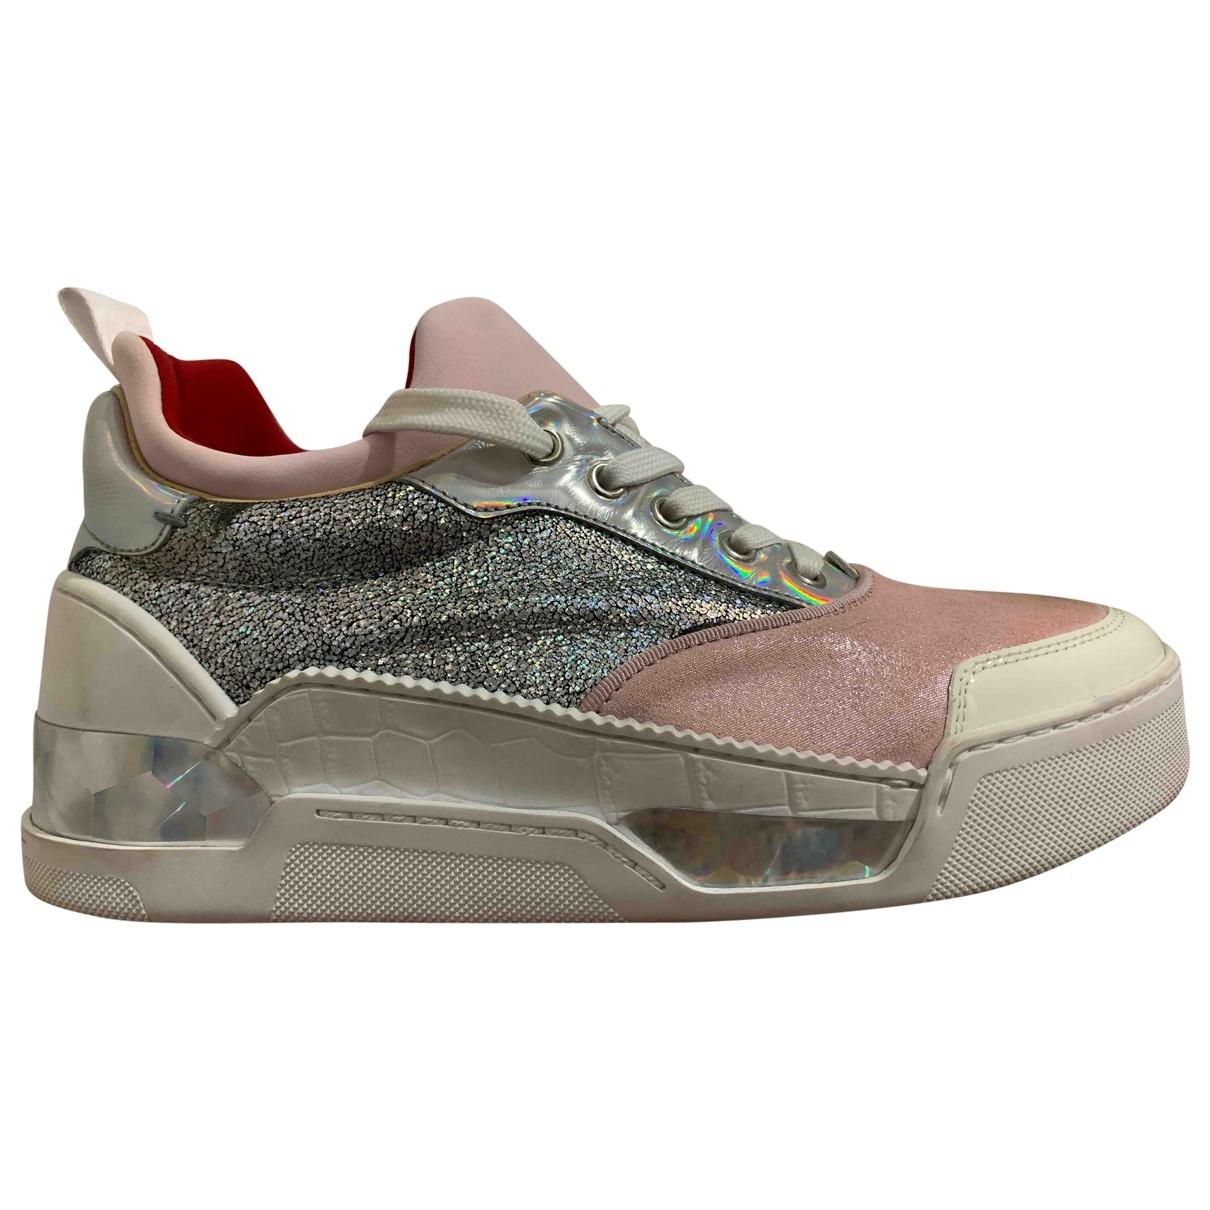 Christian Louboutin Red Runner Donna Glitter Sunset Sneakers in  Bunt Lackleder